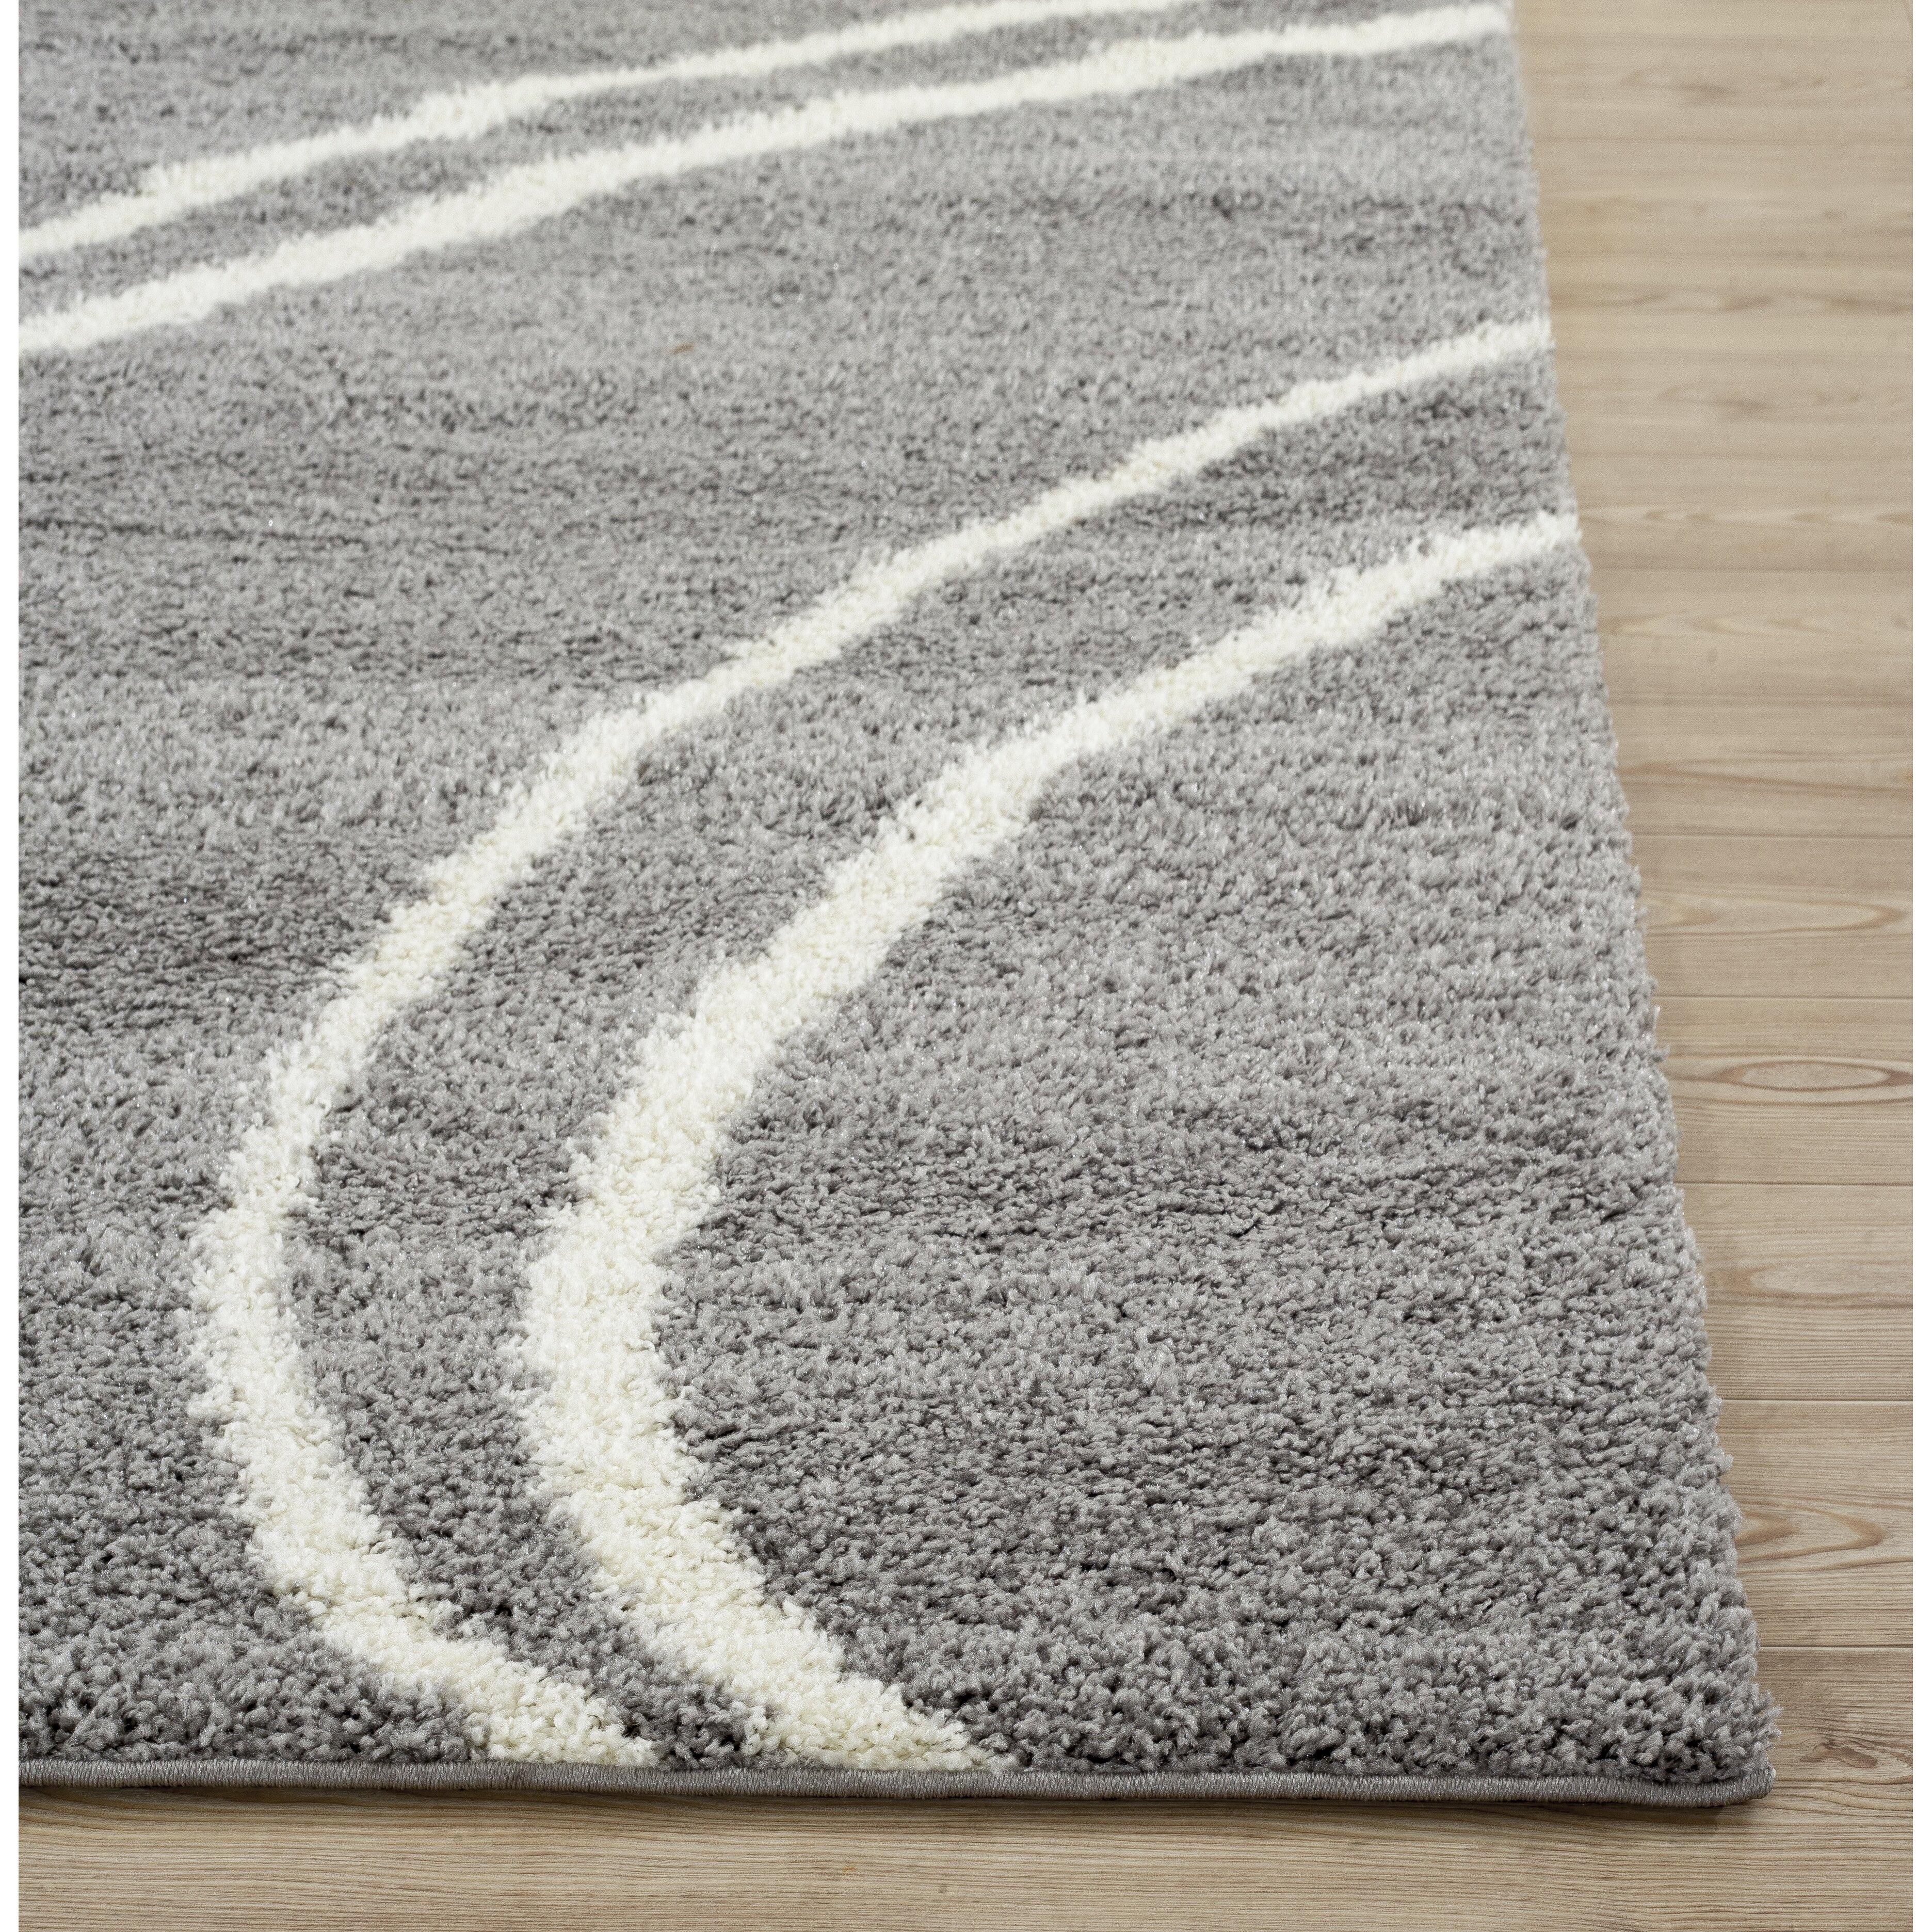 world rug gallery florida light gray white area rug reviews wayfair. Black Bedroom Furniture Sets. Home Design Ideas